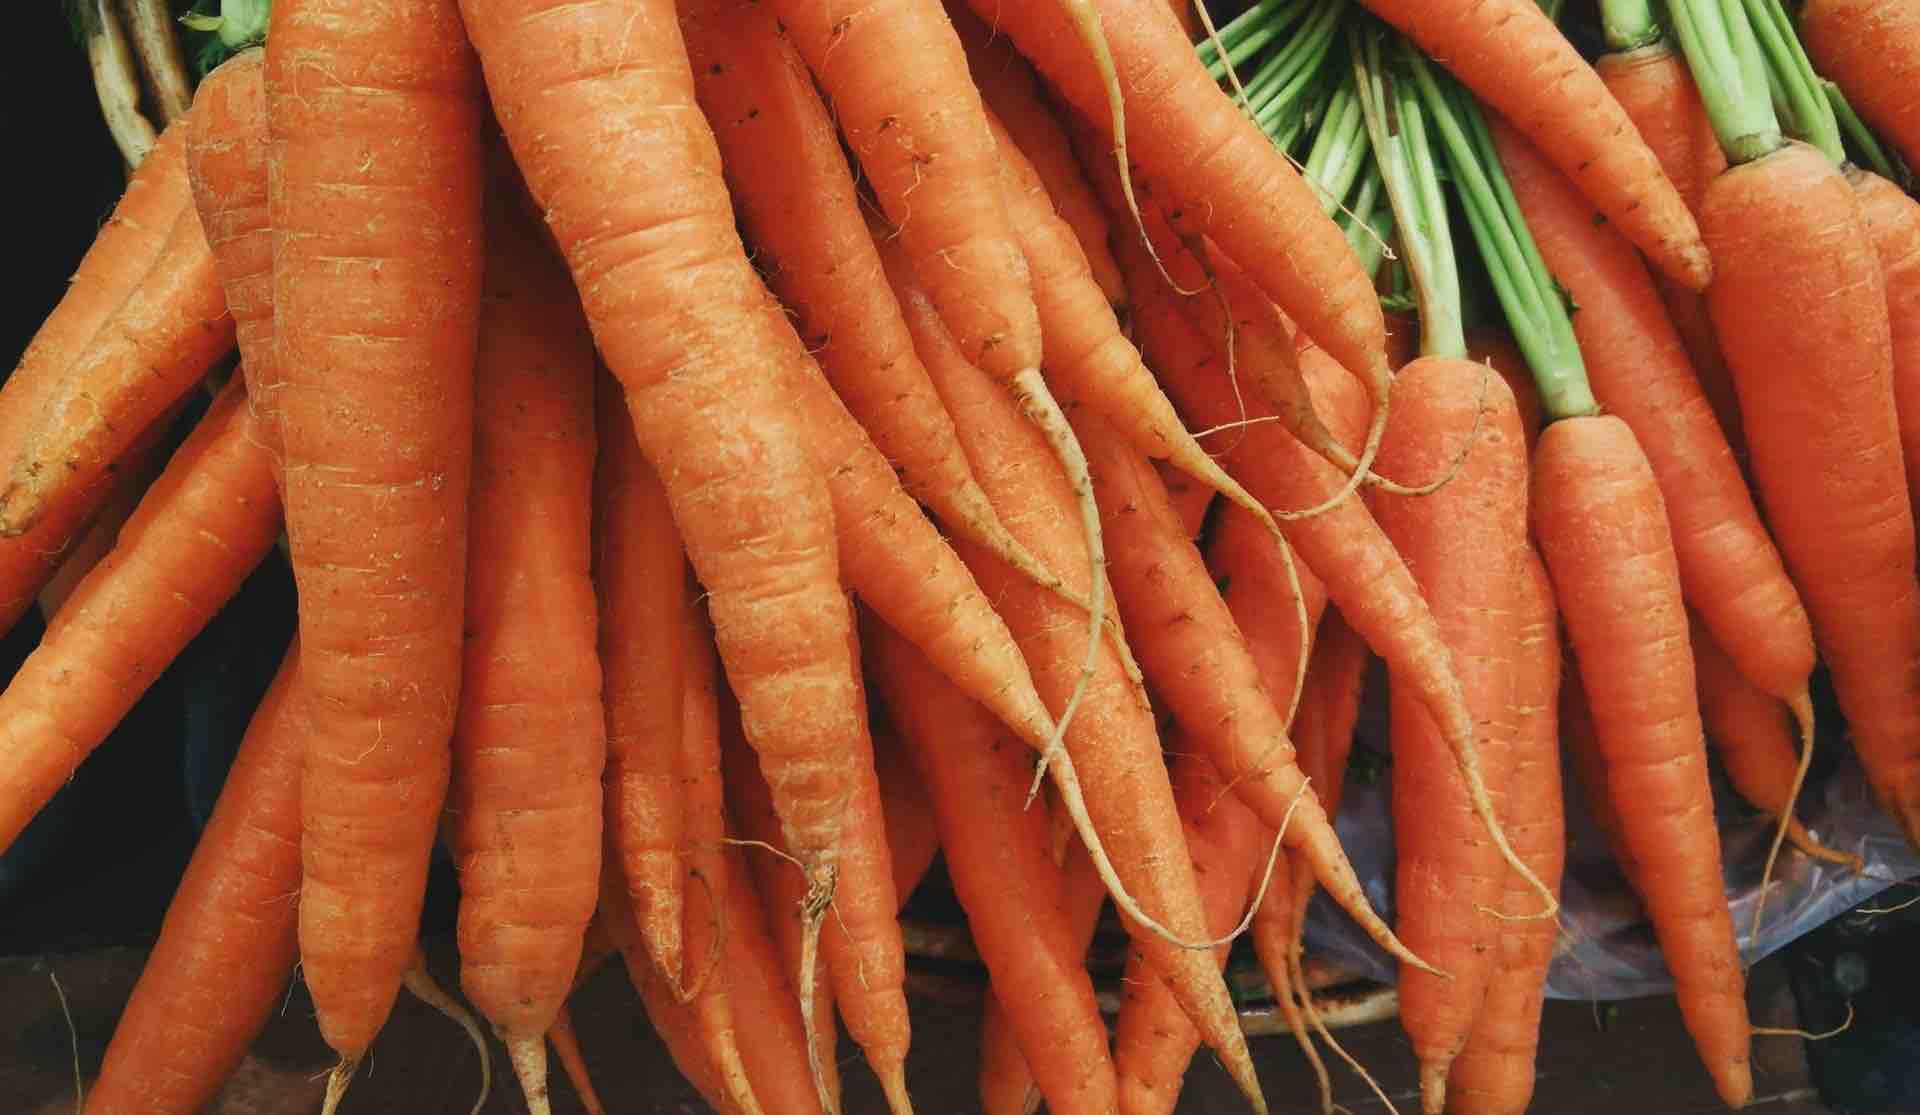 carottes orange poignée